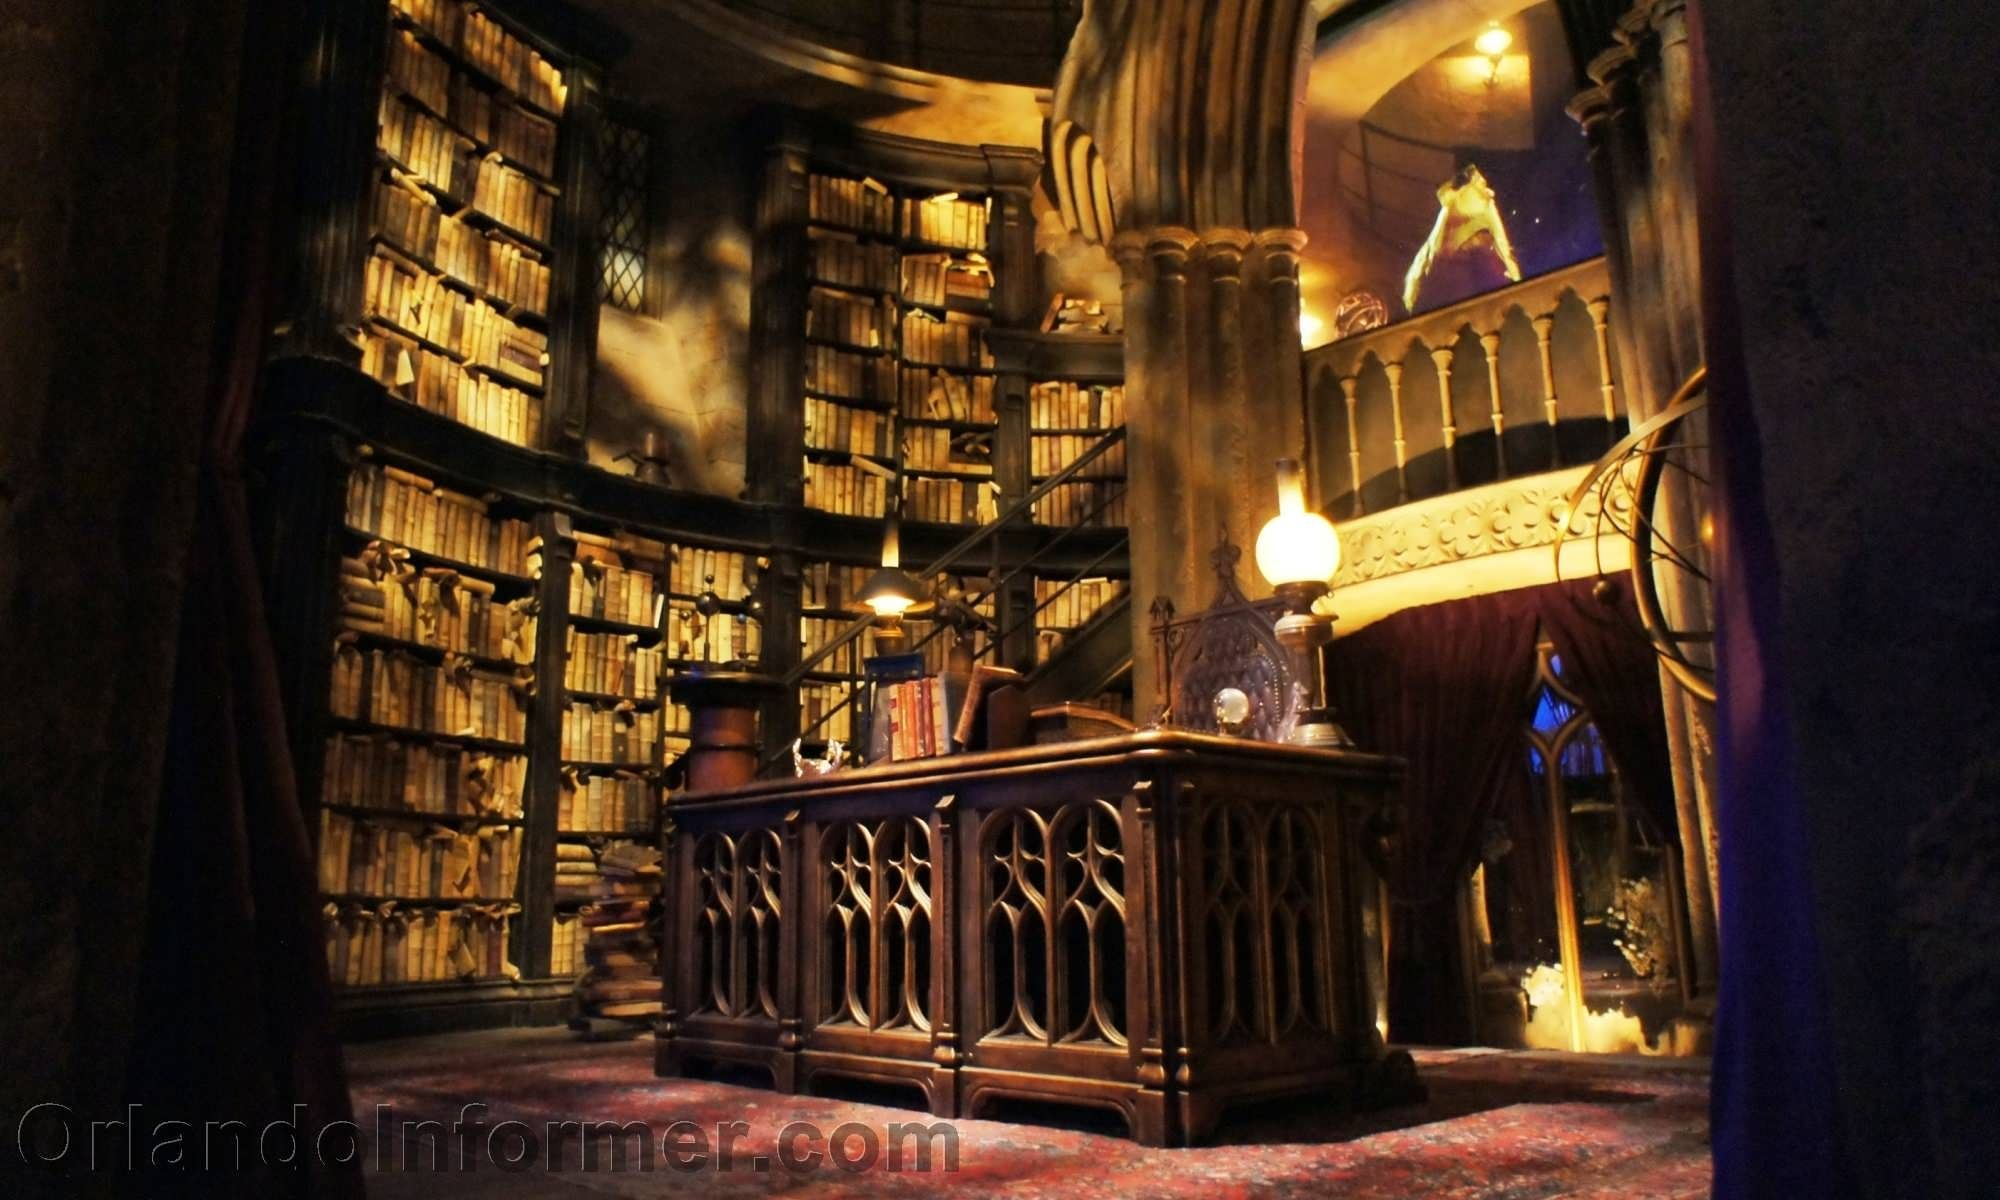 Forbidden Journey Ultimate Unofficial Guide Dumbledores Office Hogwarts Islands Of Adventure